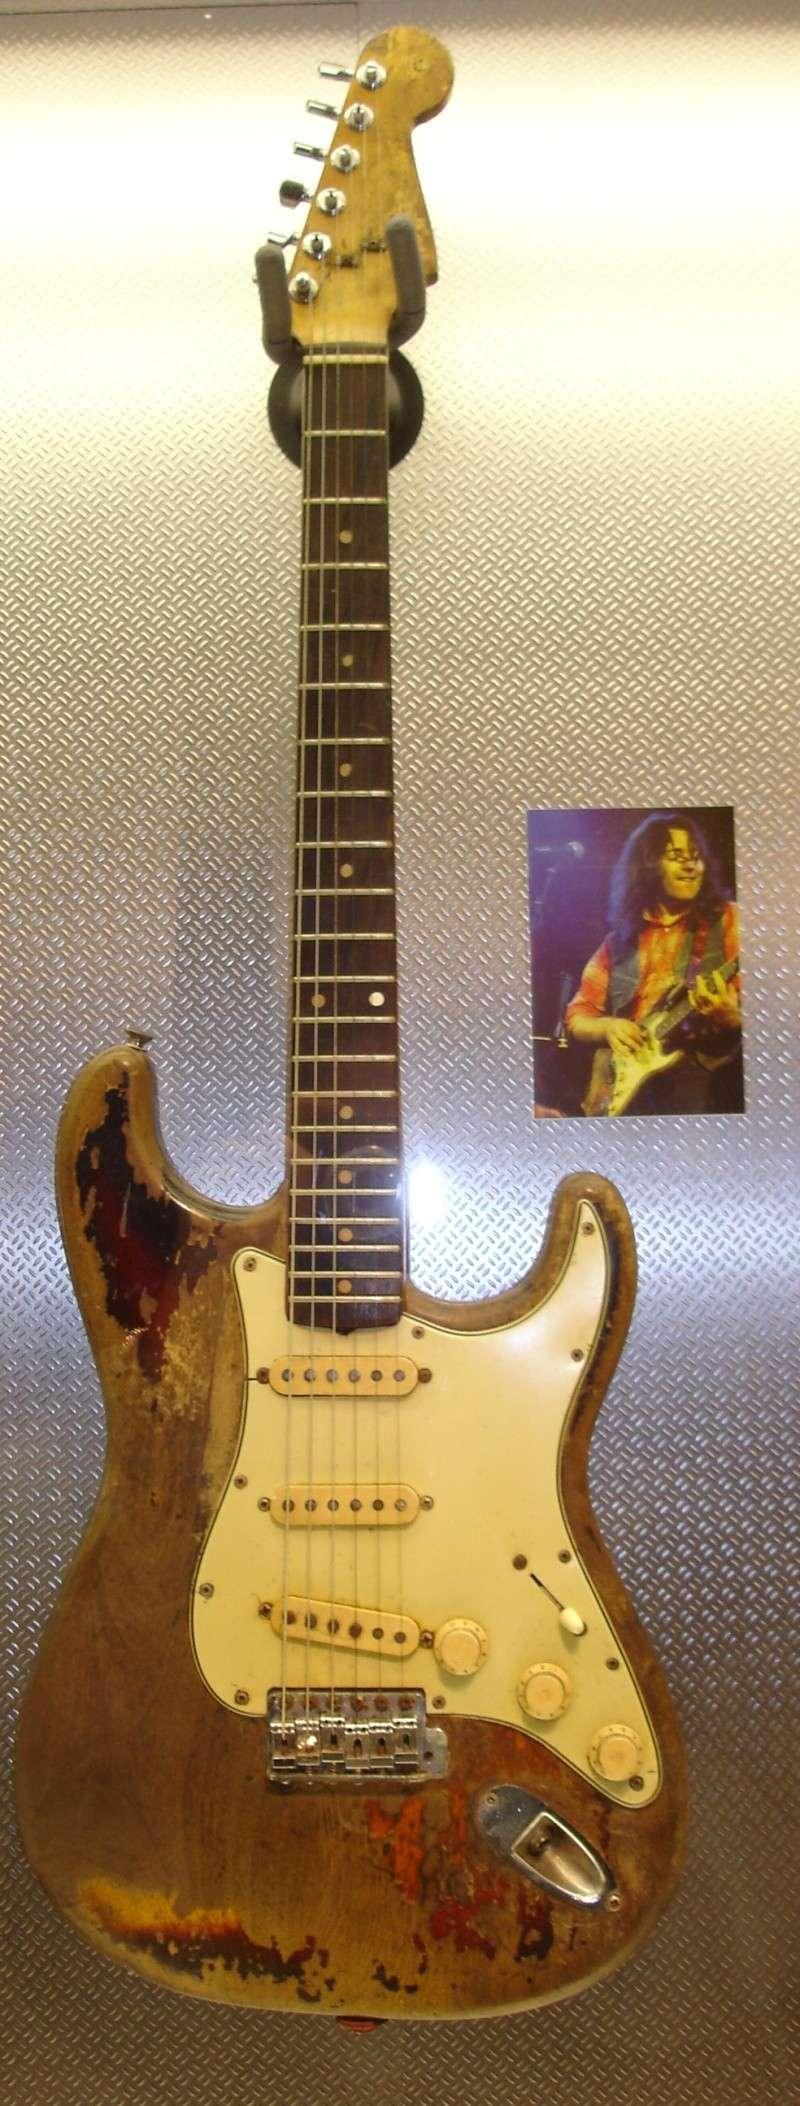 Fender Stratocaster 1961 - Page 5 Dsc01510